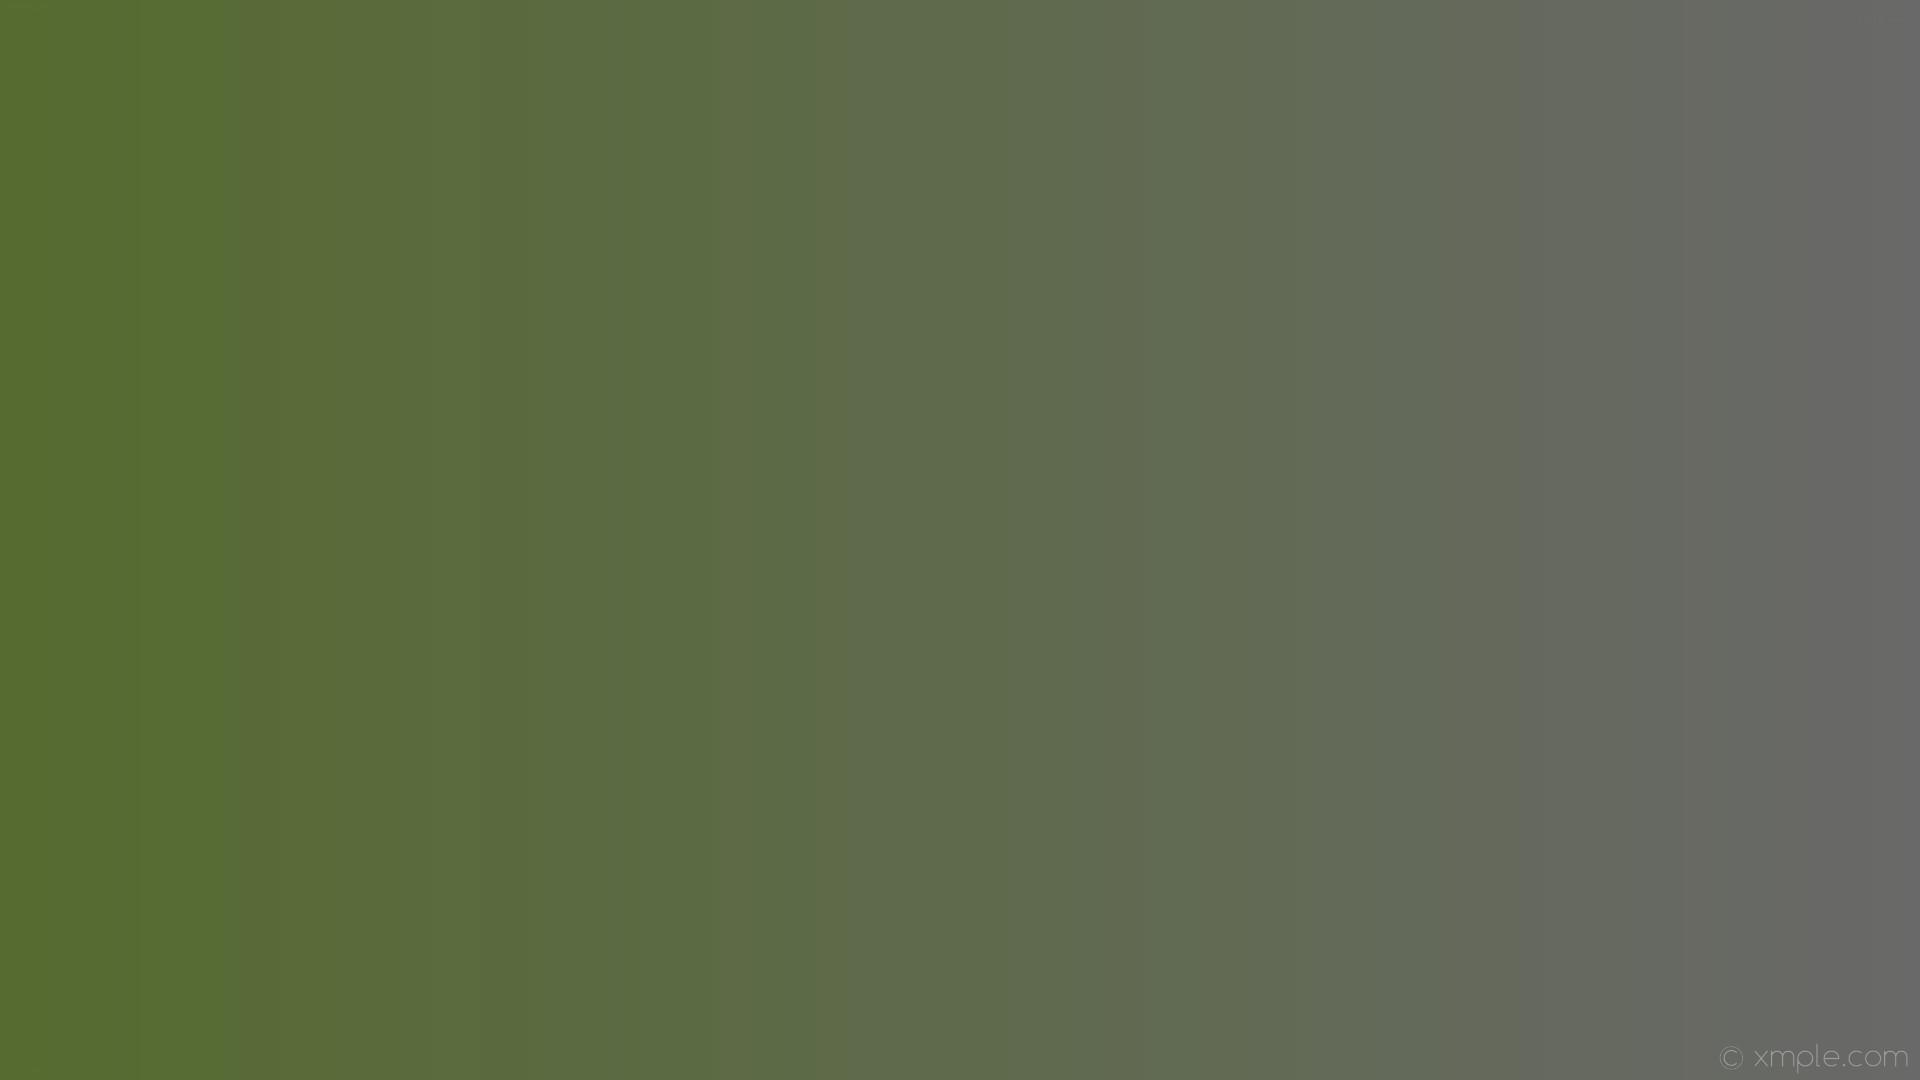 Res: 1920x1080, wallpaper linear gradient grey green dark olive green dim gray #556b2f  #696969 180°